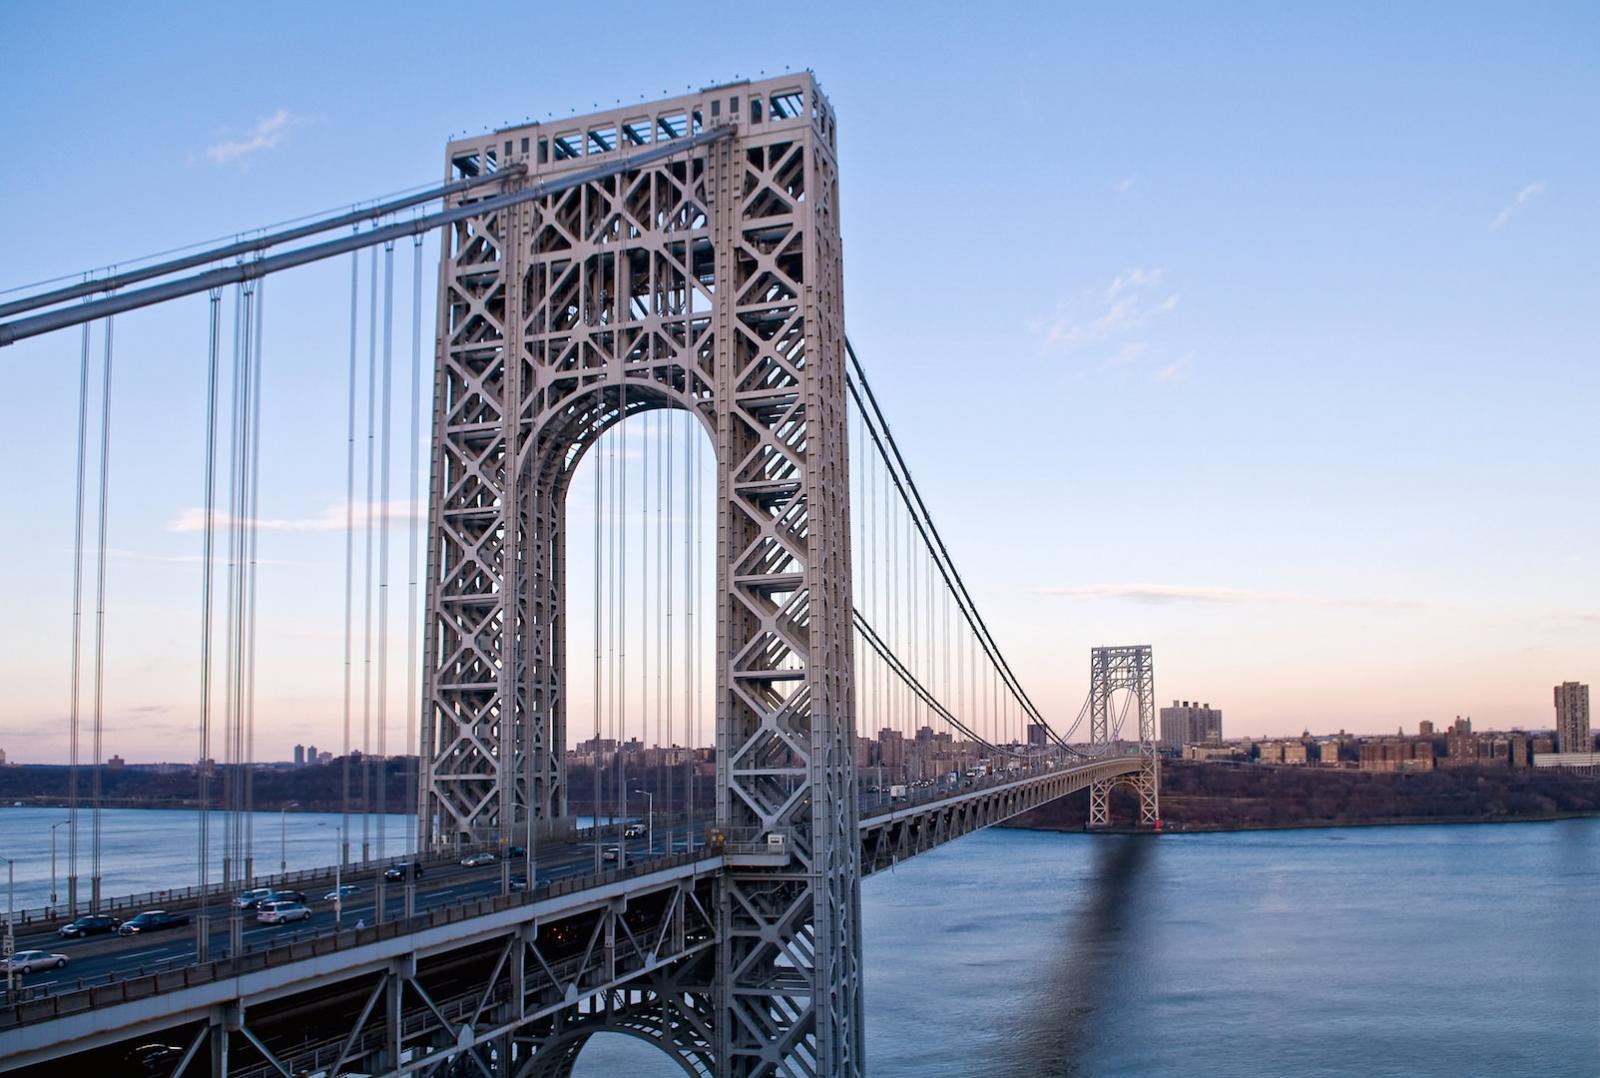 Die George Washington Bridge